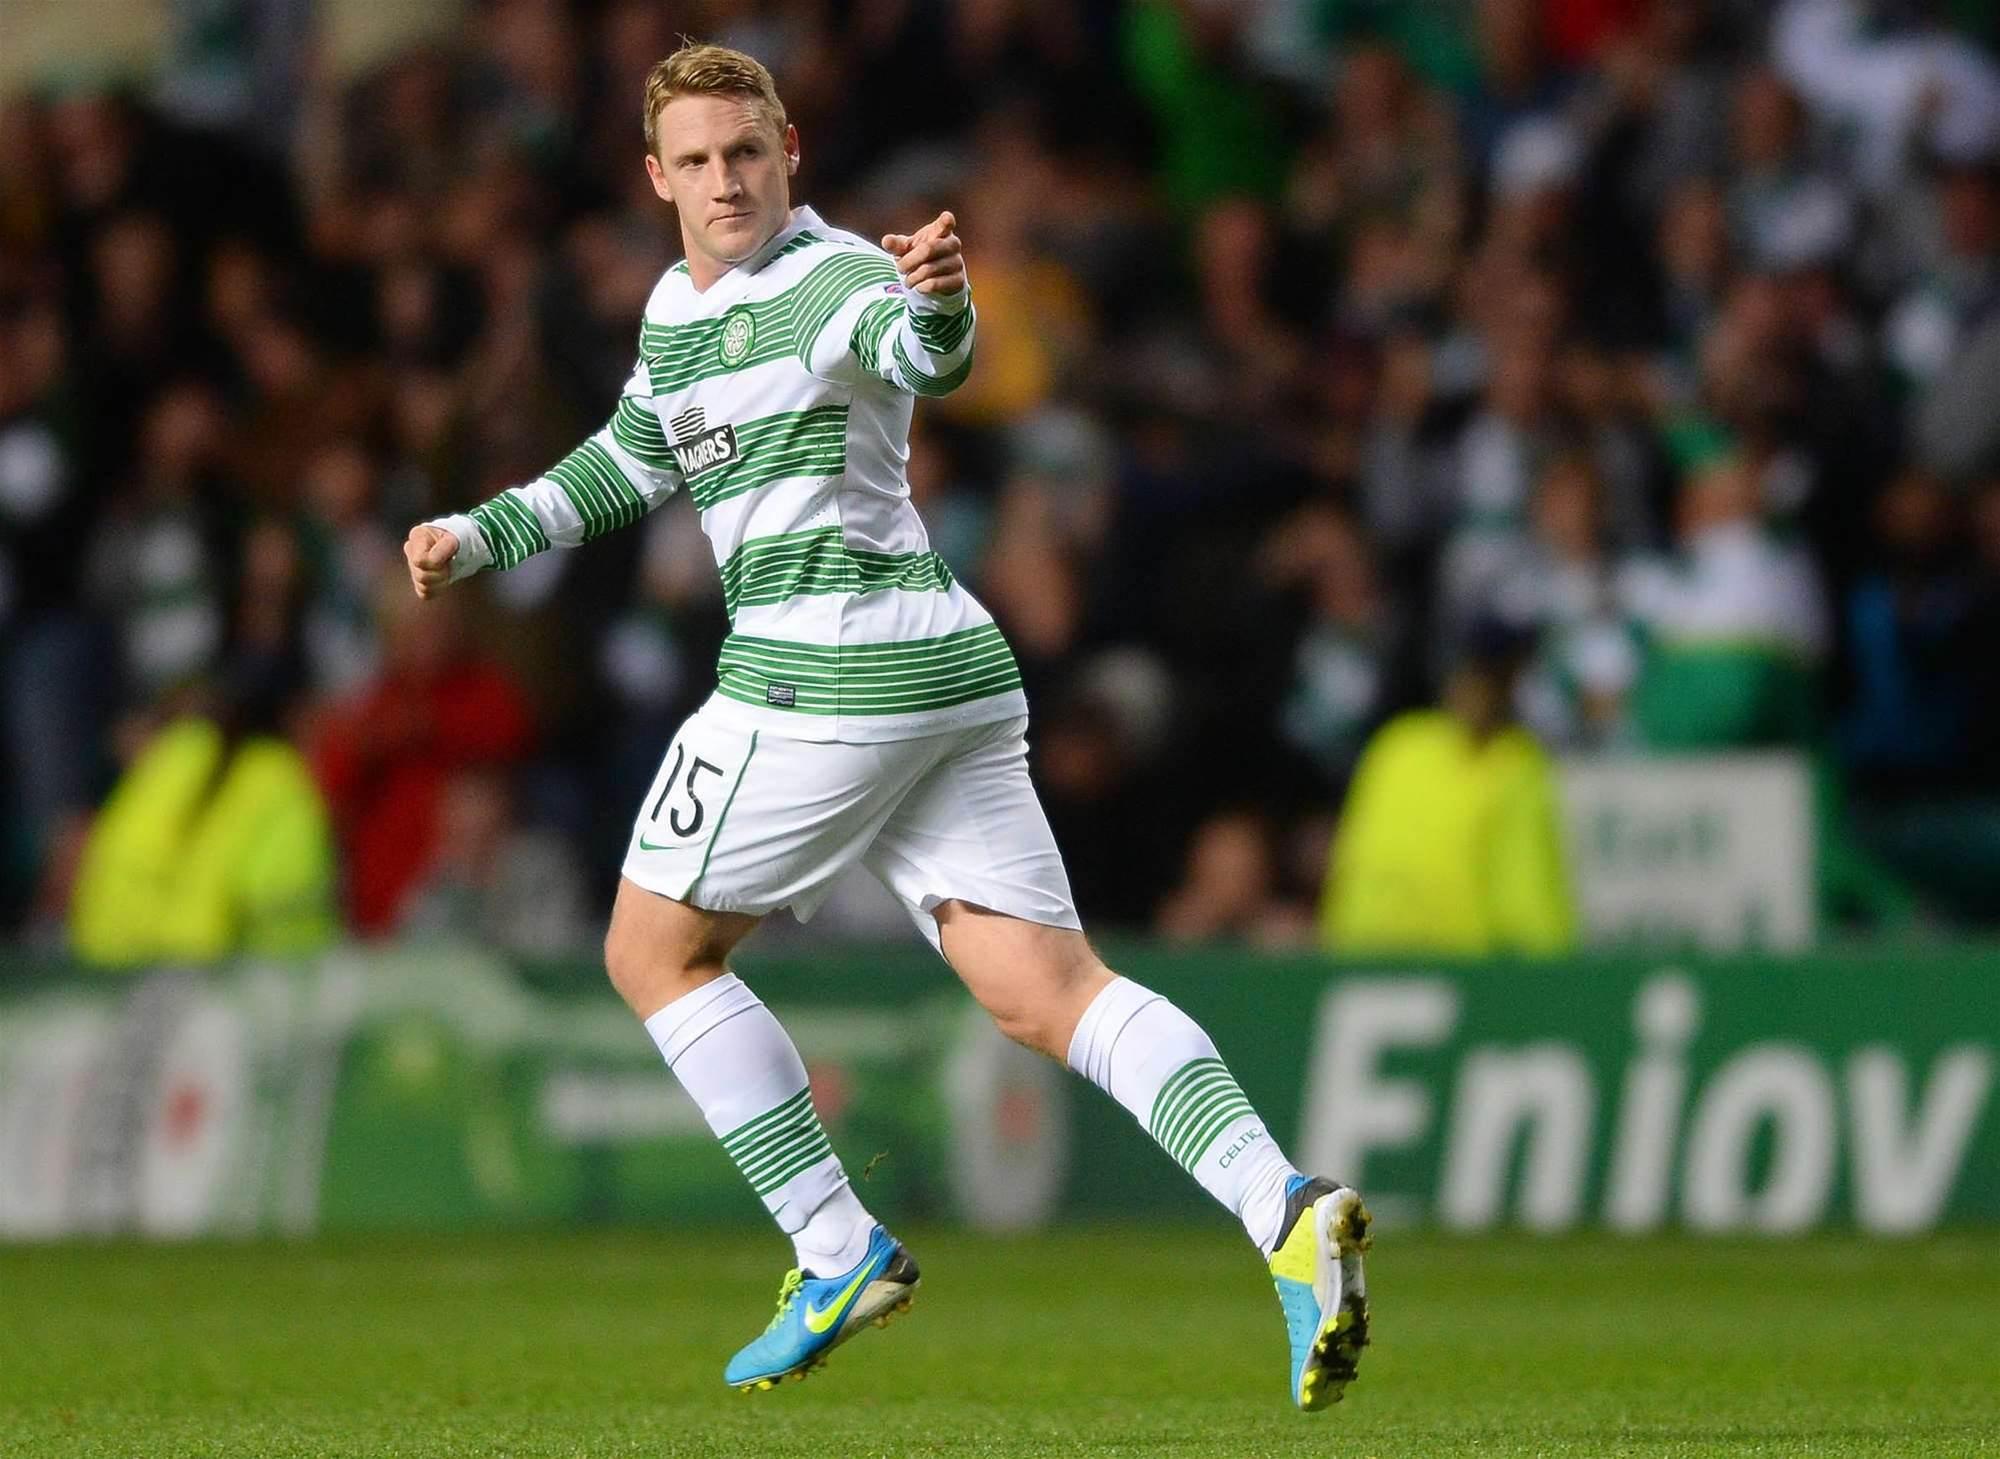 Celtic smash Motherwell 5-0